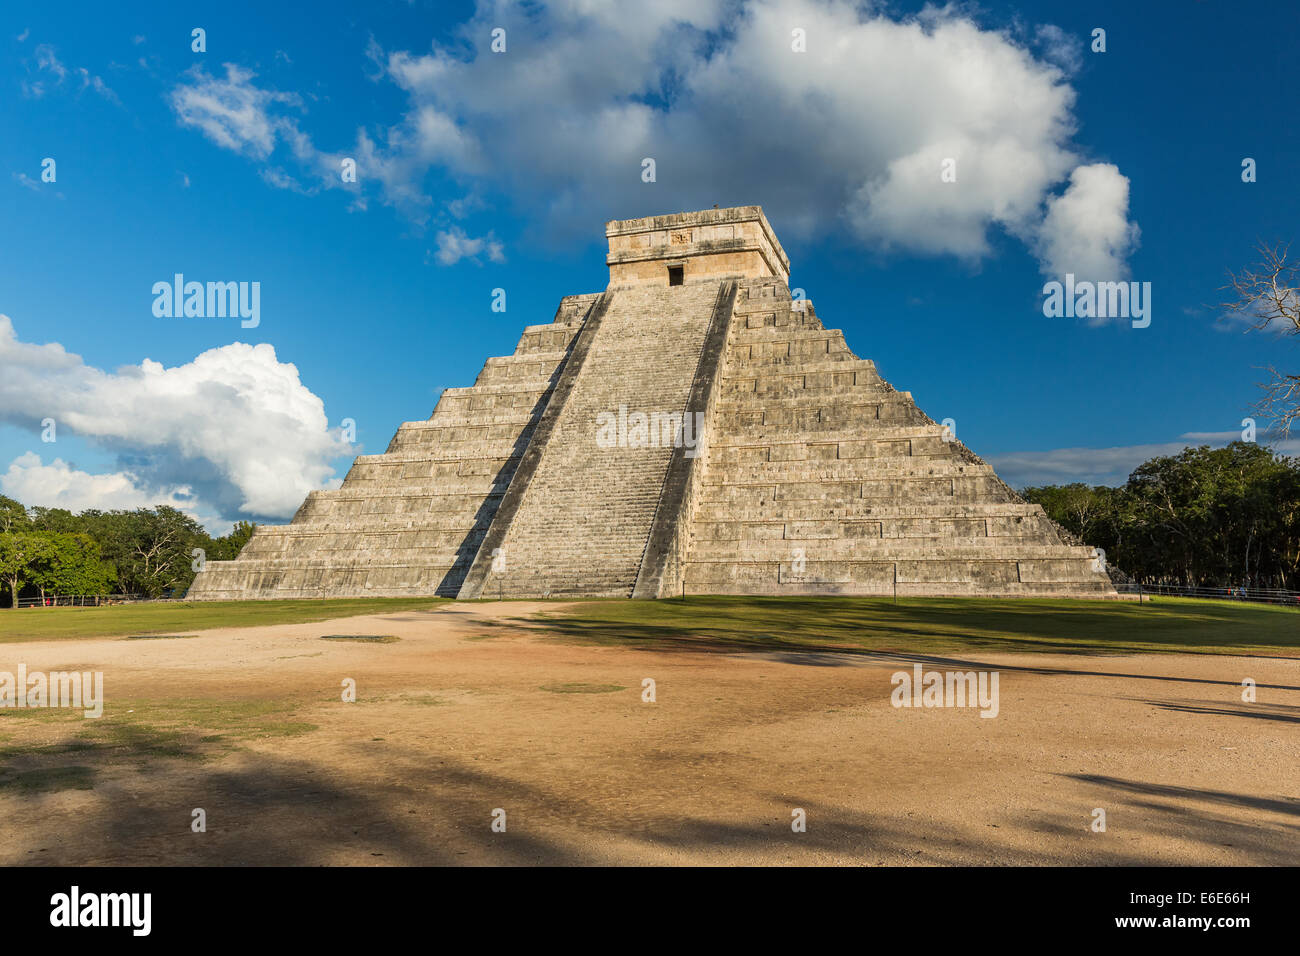 Pyramid of Kukulkan Chichen Itza, Mexico - Stock Image